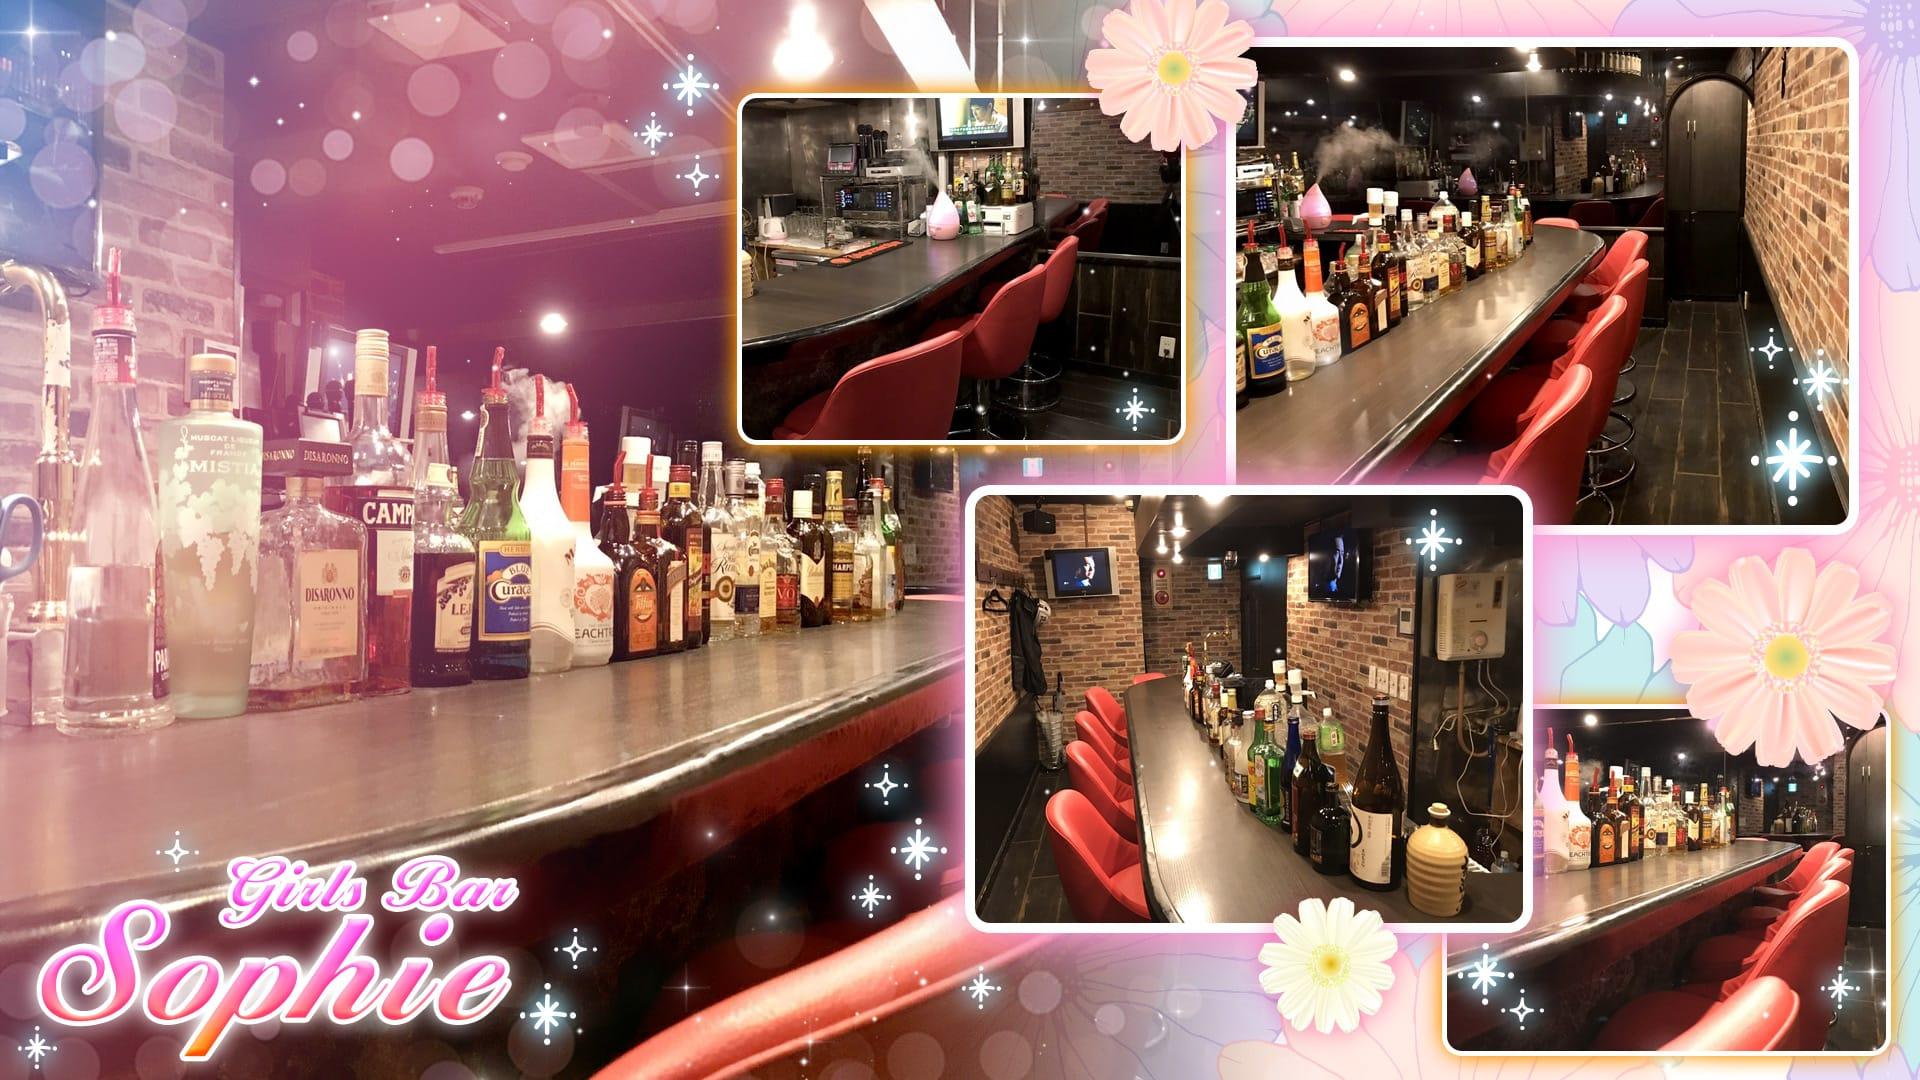 Girls Bar Sophie<ガールズバー ソフィー> 自由が丘 ガールズバー TOP画像